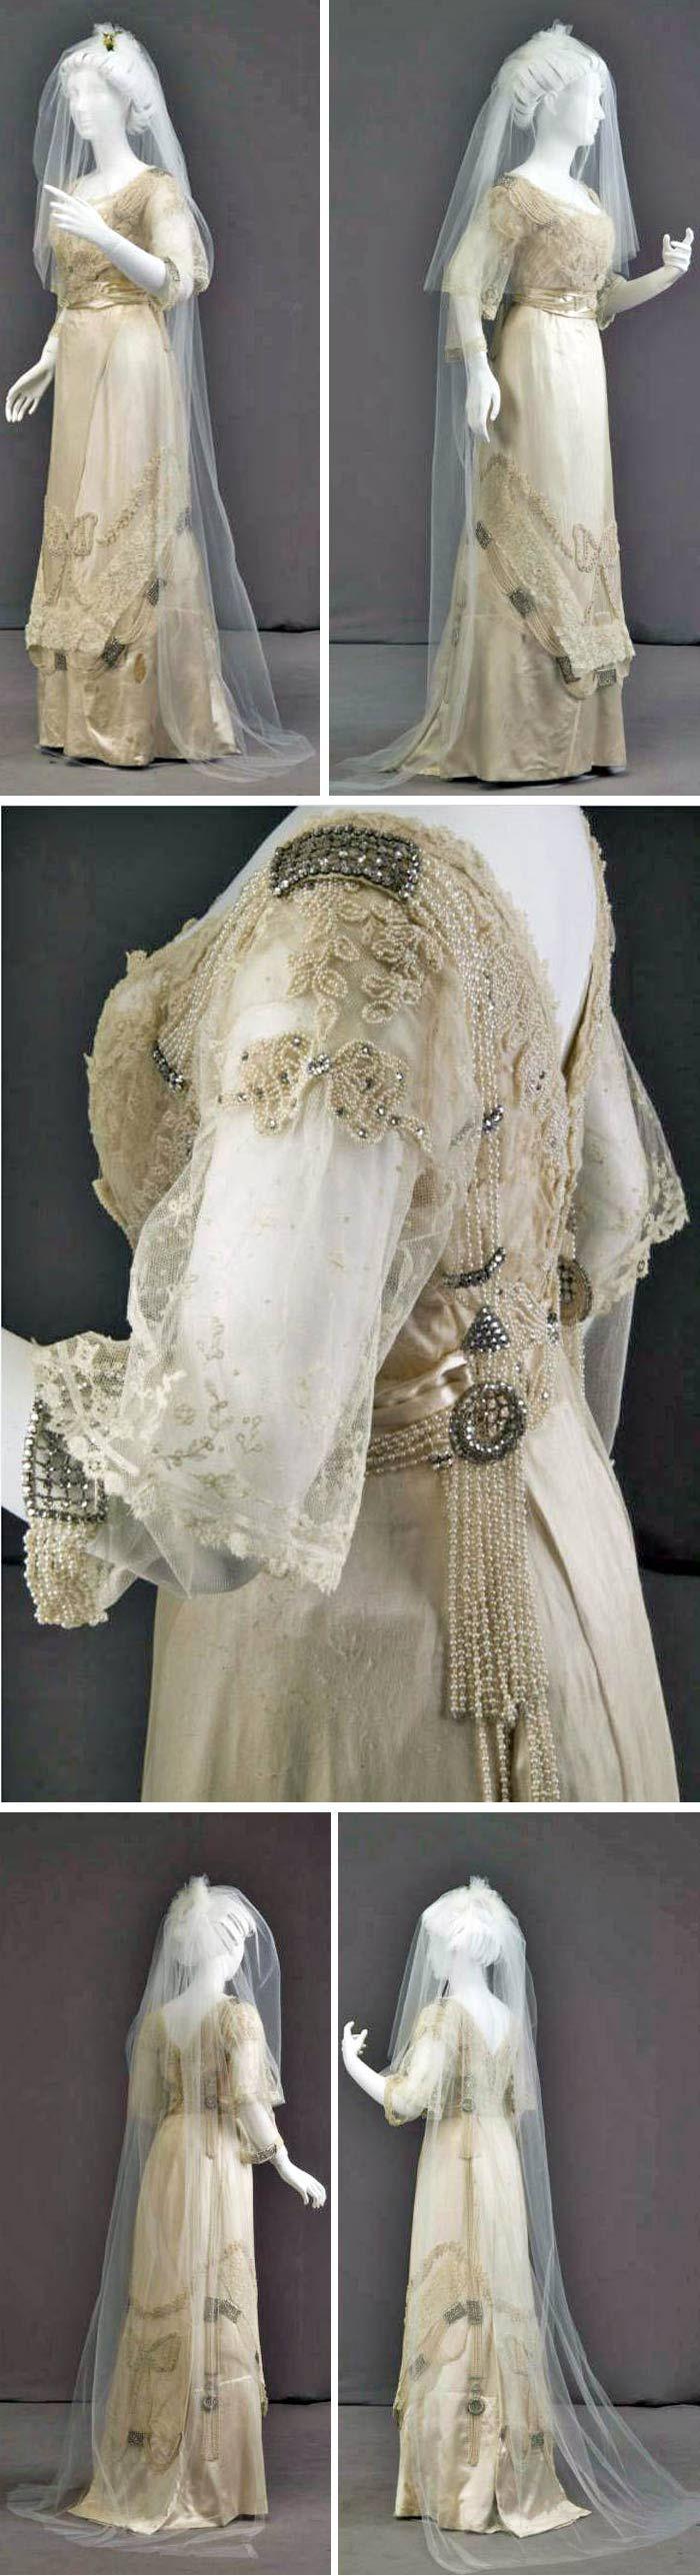 Wedding Dress, Marshall Field U0026 Co., Chicago, 1911. Silk Satin,